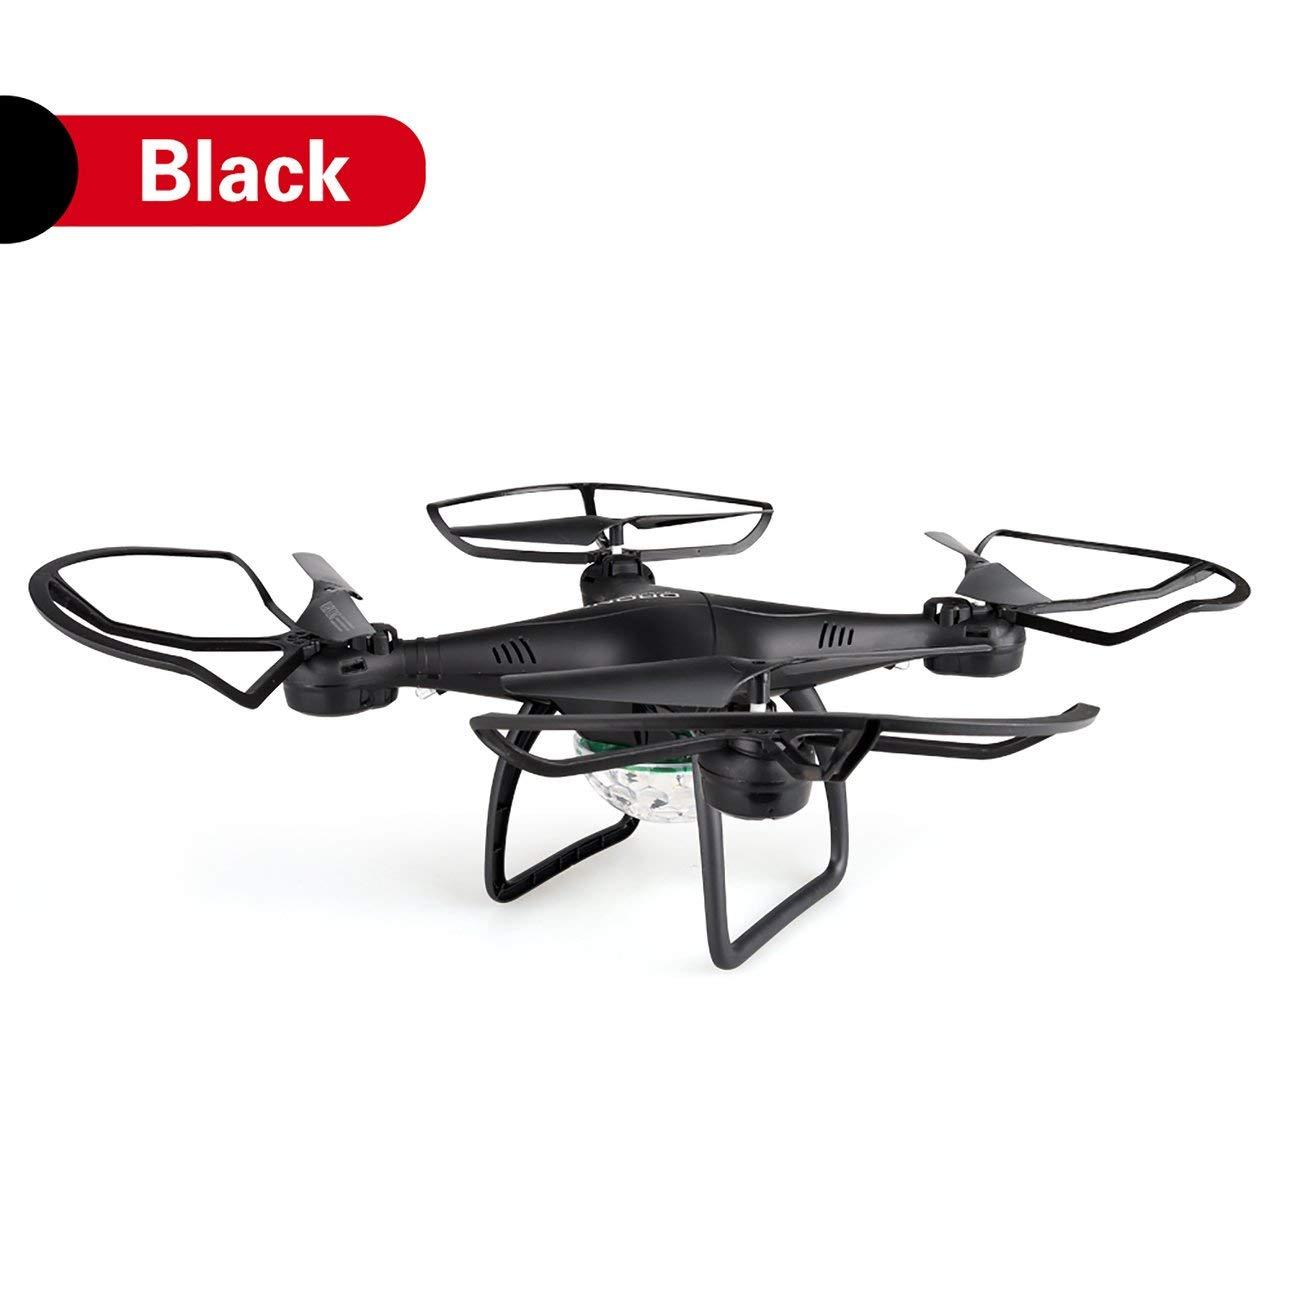 Ballylelly Drone Axis Aircraft RC Quadcopter Drone Helicopter Modelo Modelo Modelo Juguetes electroacute;nicos (Negro) 907d1d